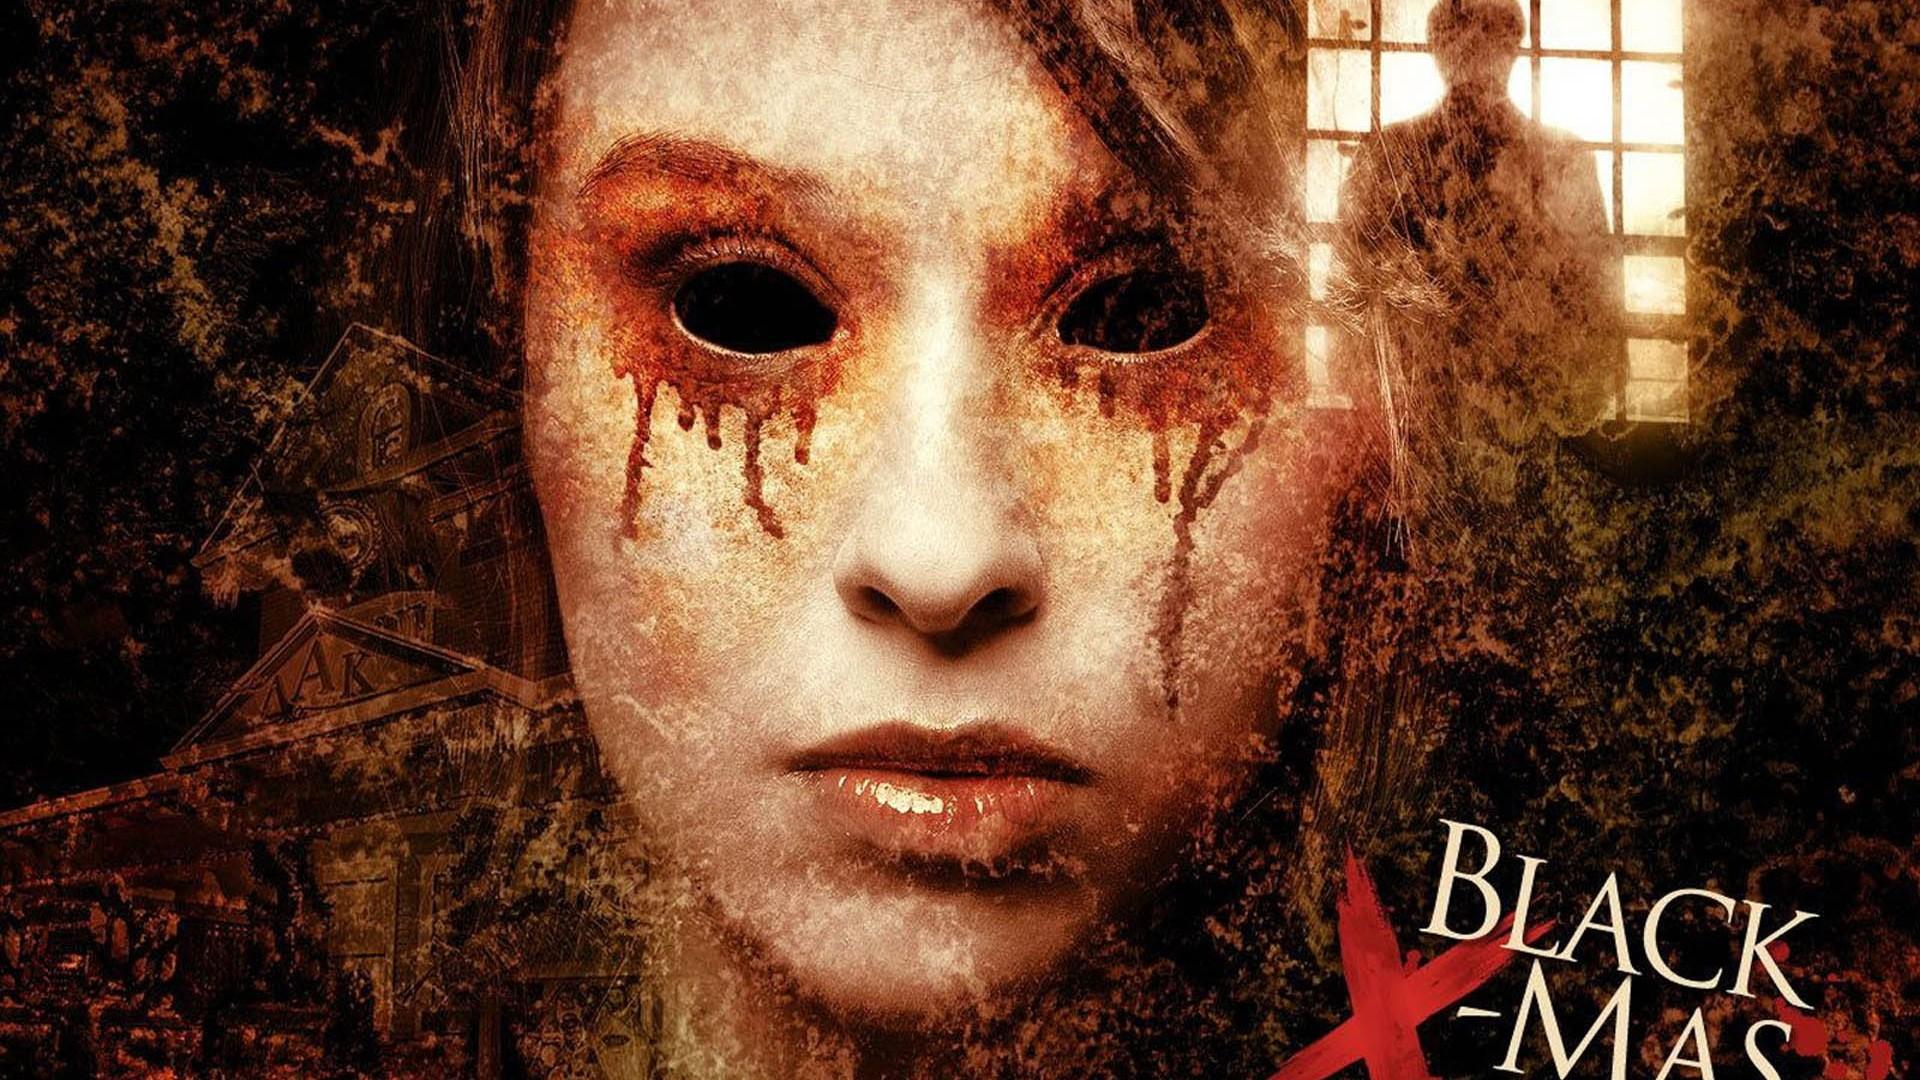 … Horror Wallpaper, Background Full HD 1080p. Wallpaper black  christmas, face, black, eyes, blood, dark, fear